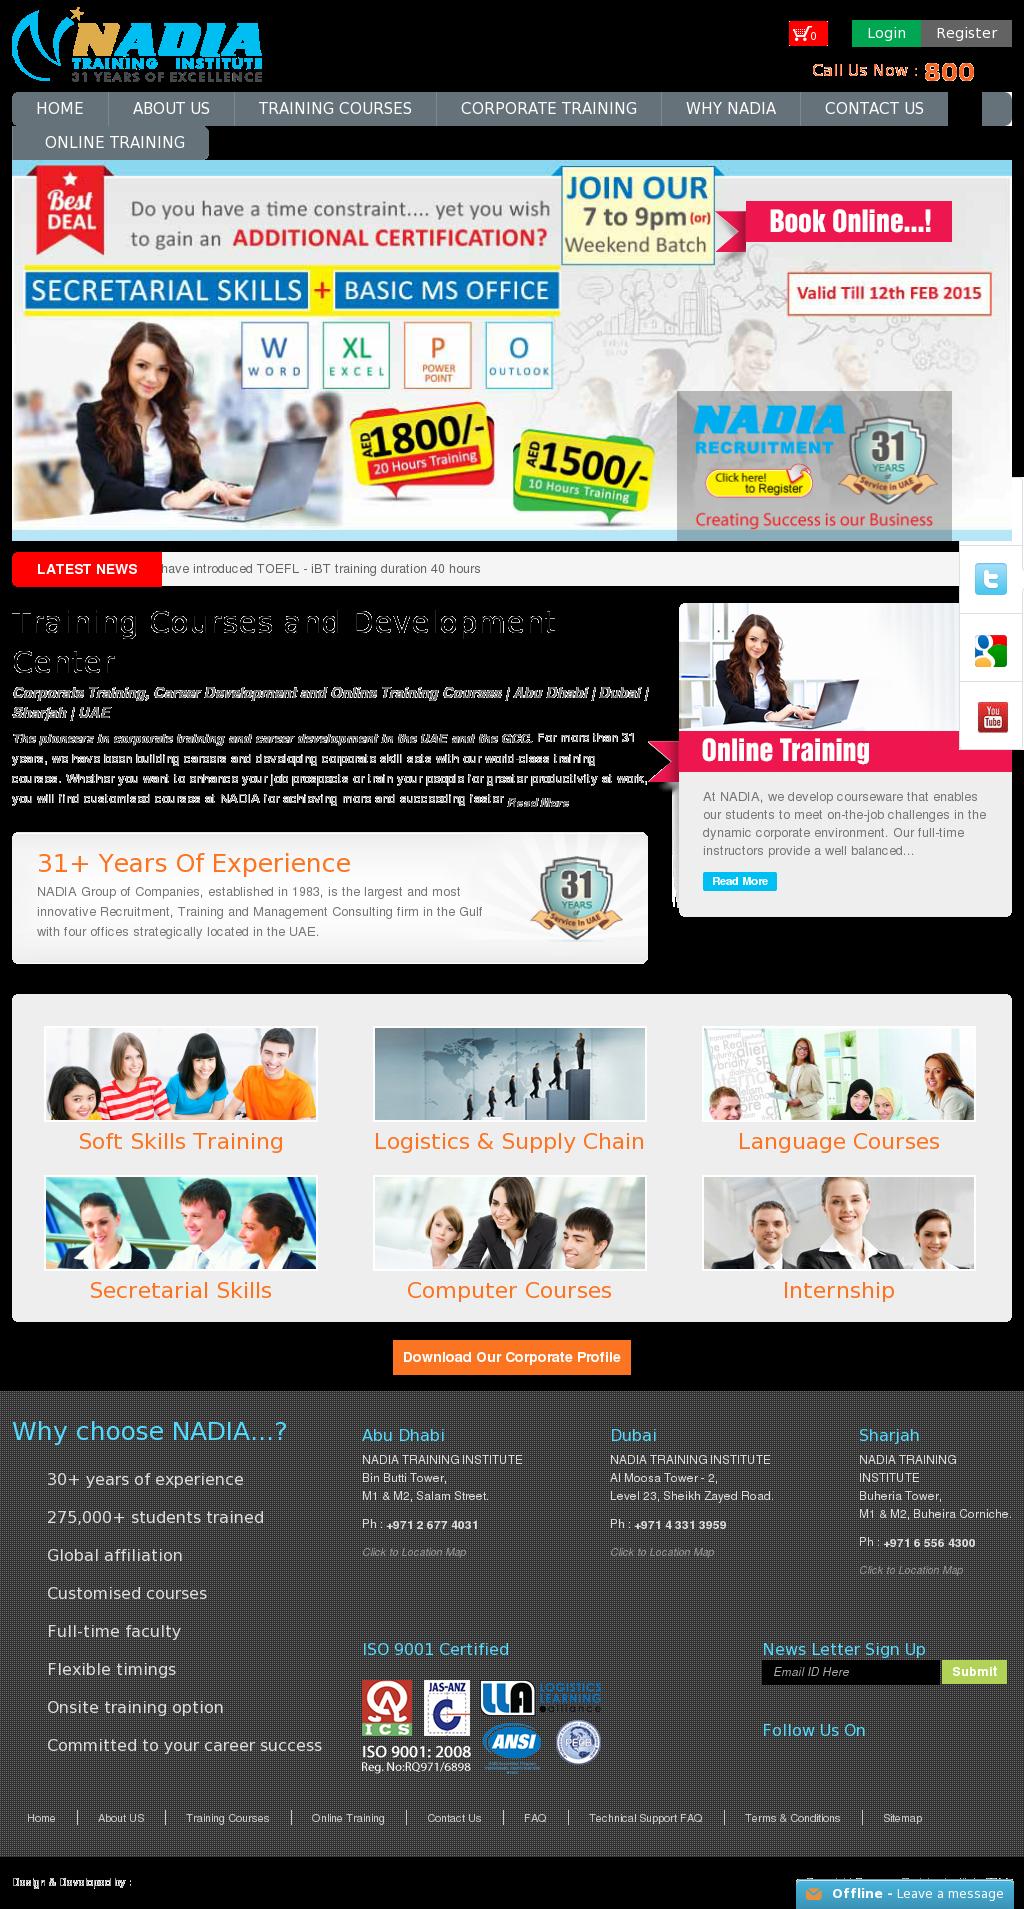 NADIA Training Institute Competitors, Revenue and Employees